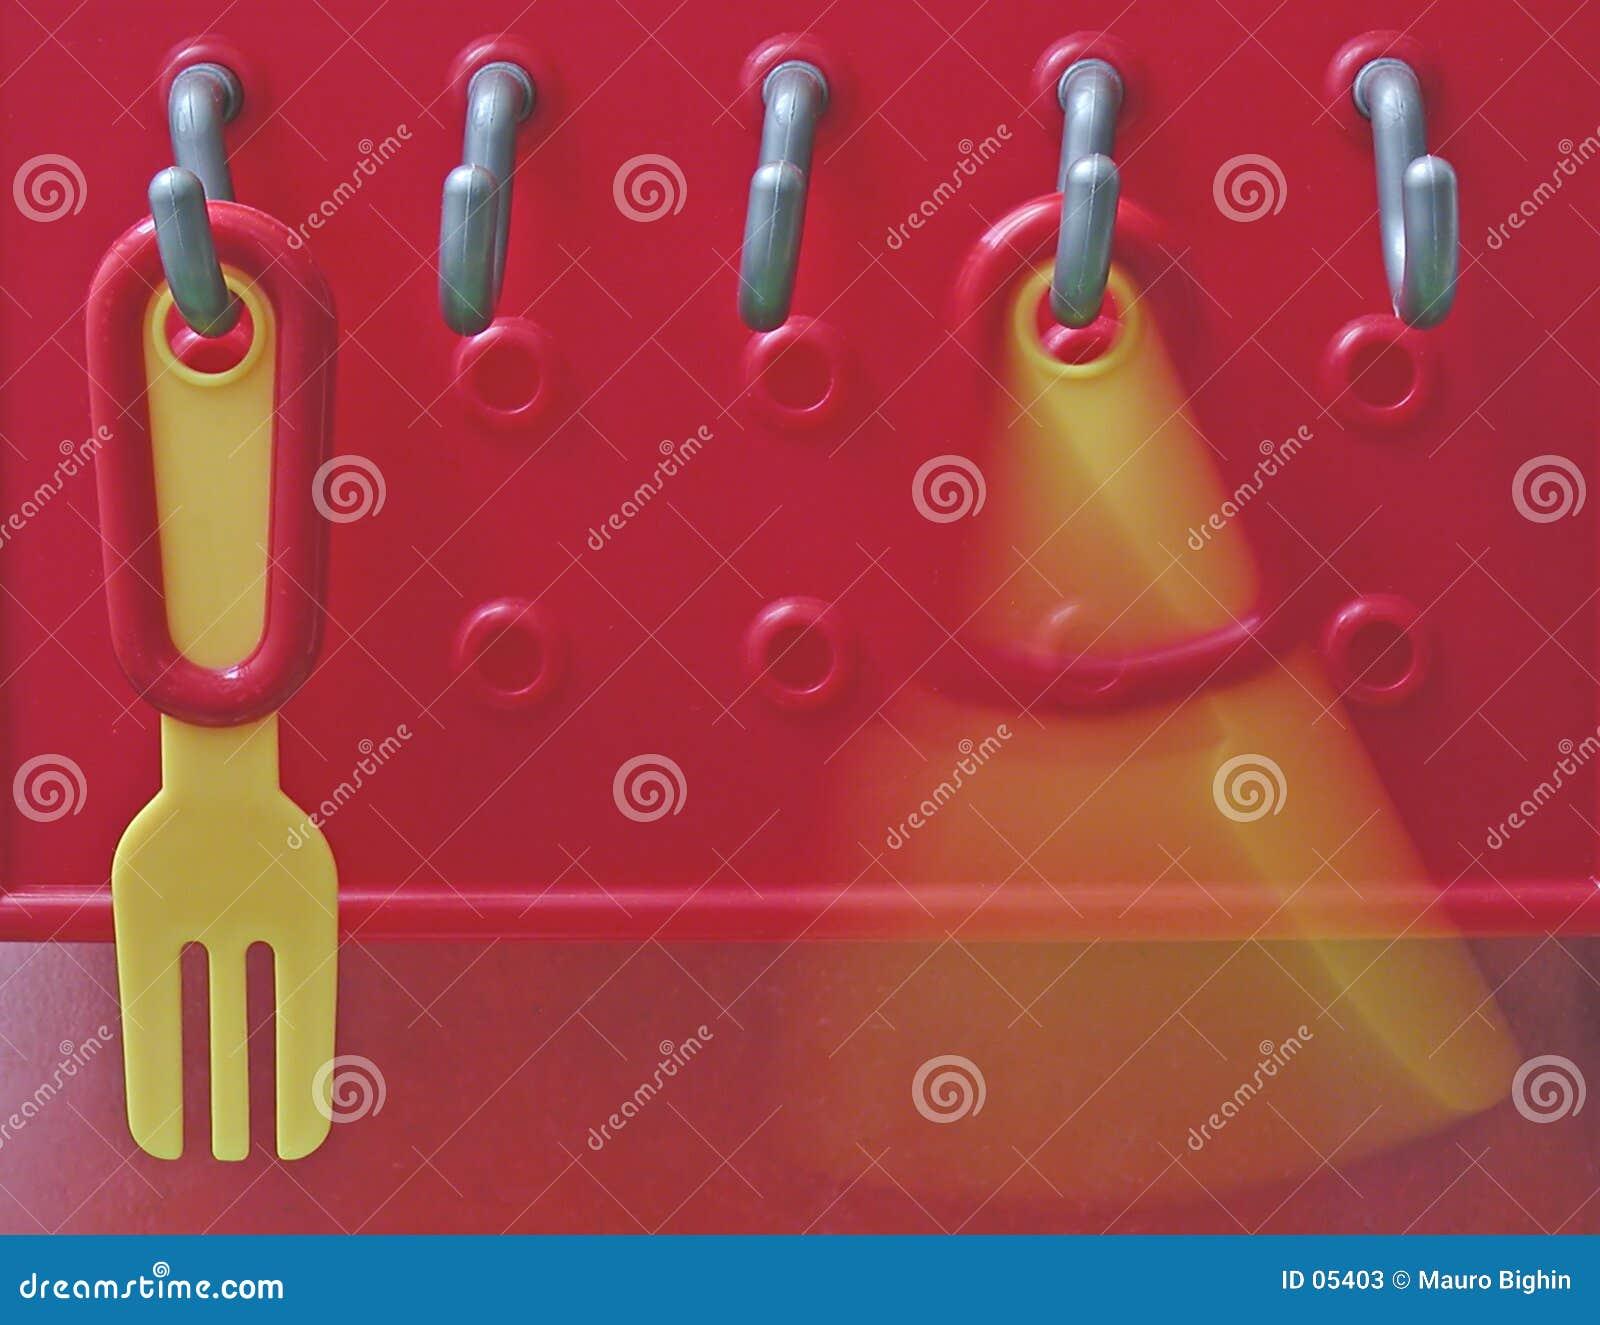 Gaffelknivplast-